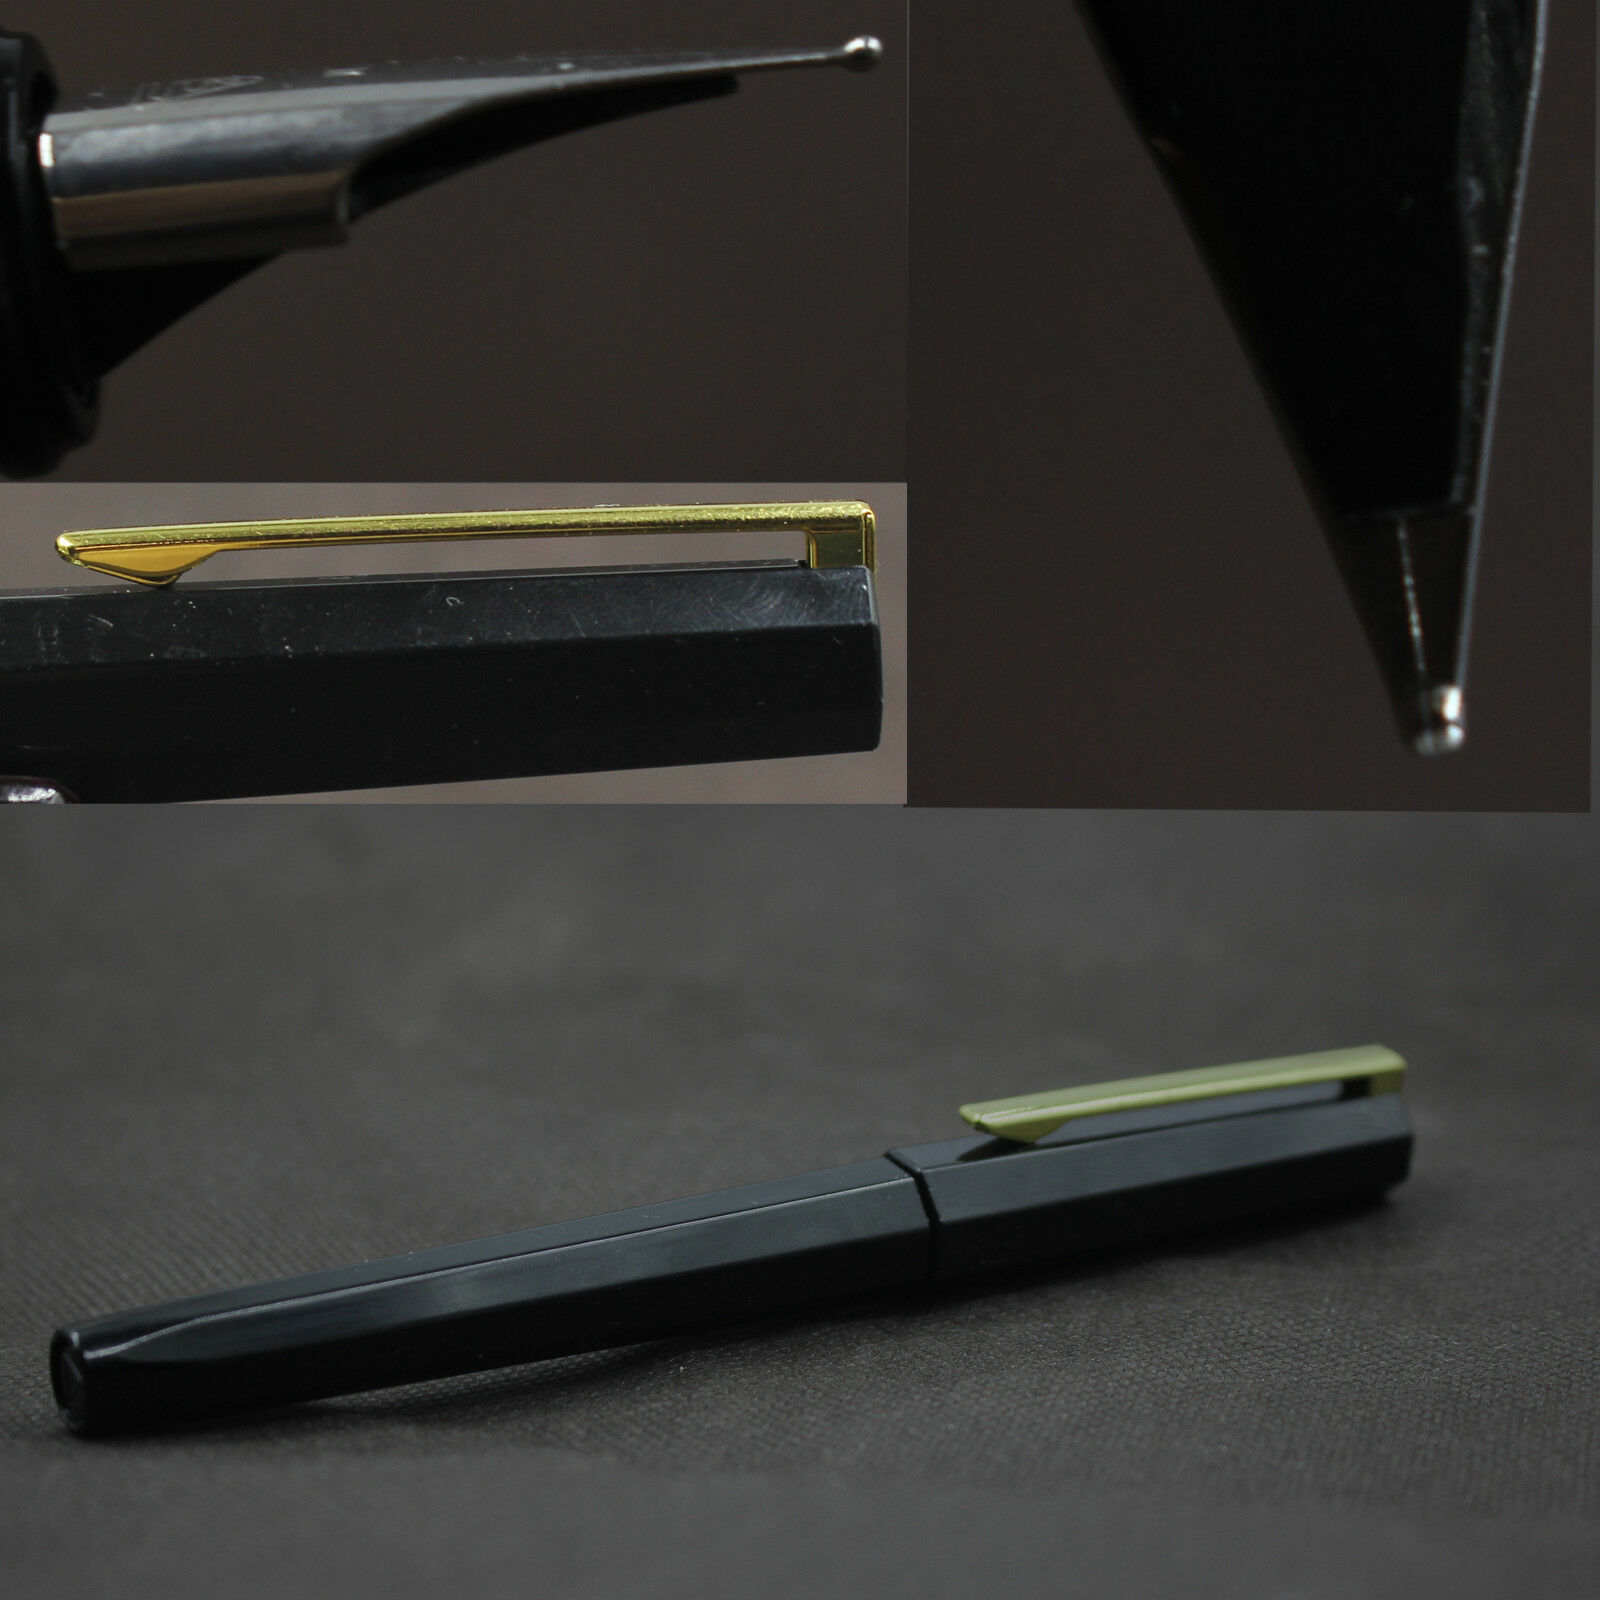 Old Stock Octagon Black Ink Window Fountain Pen Plastic Ink Pen M Wet Nib Stationery Office School Supplies Writing Gift